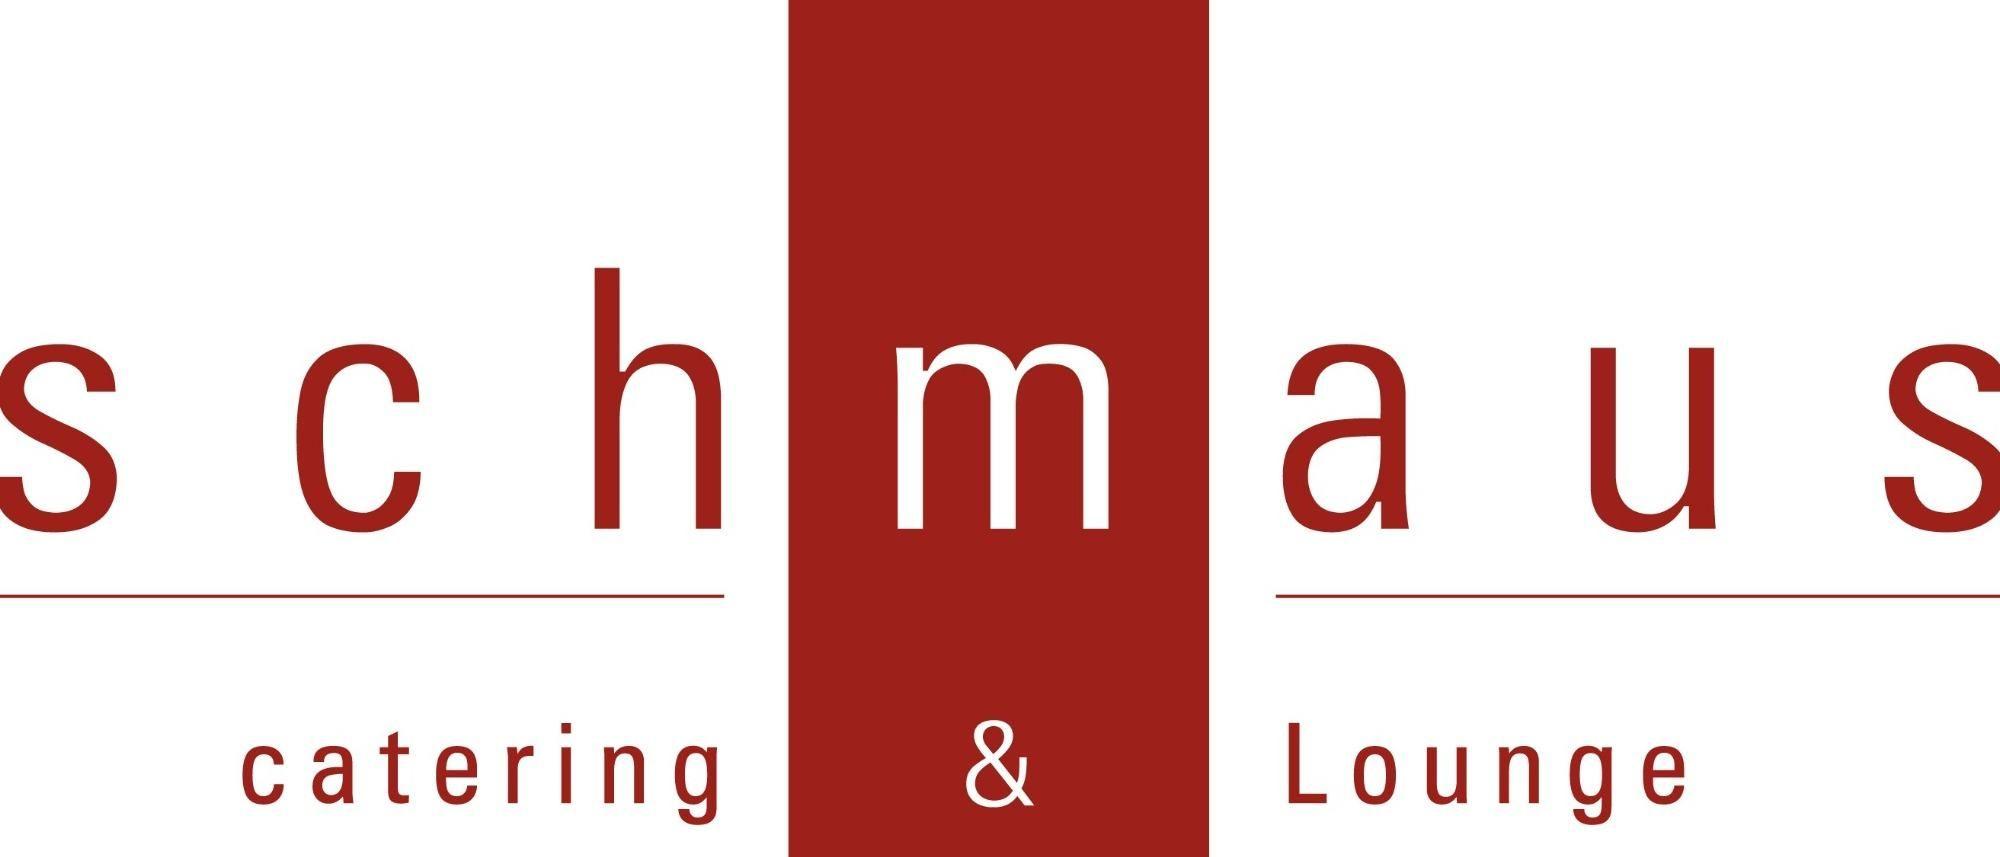 Schmaus Catering Logo